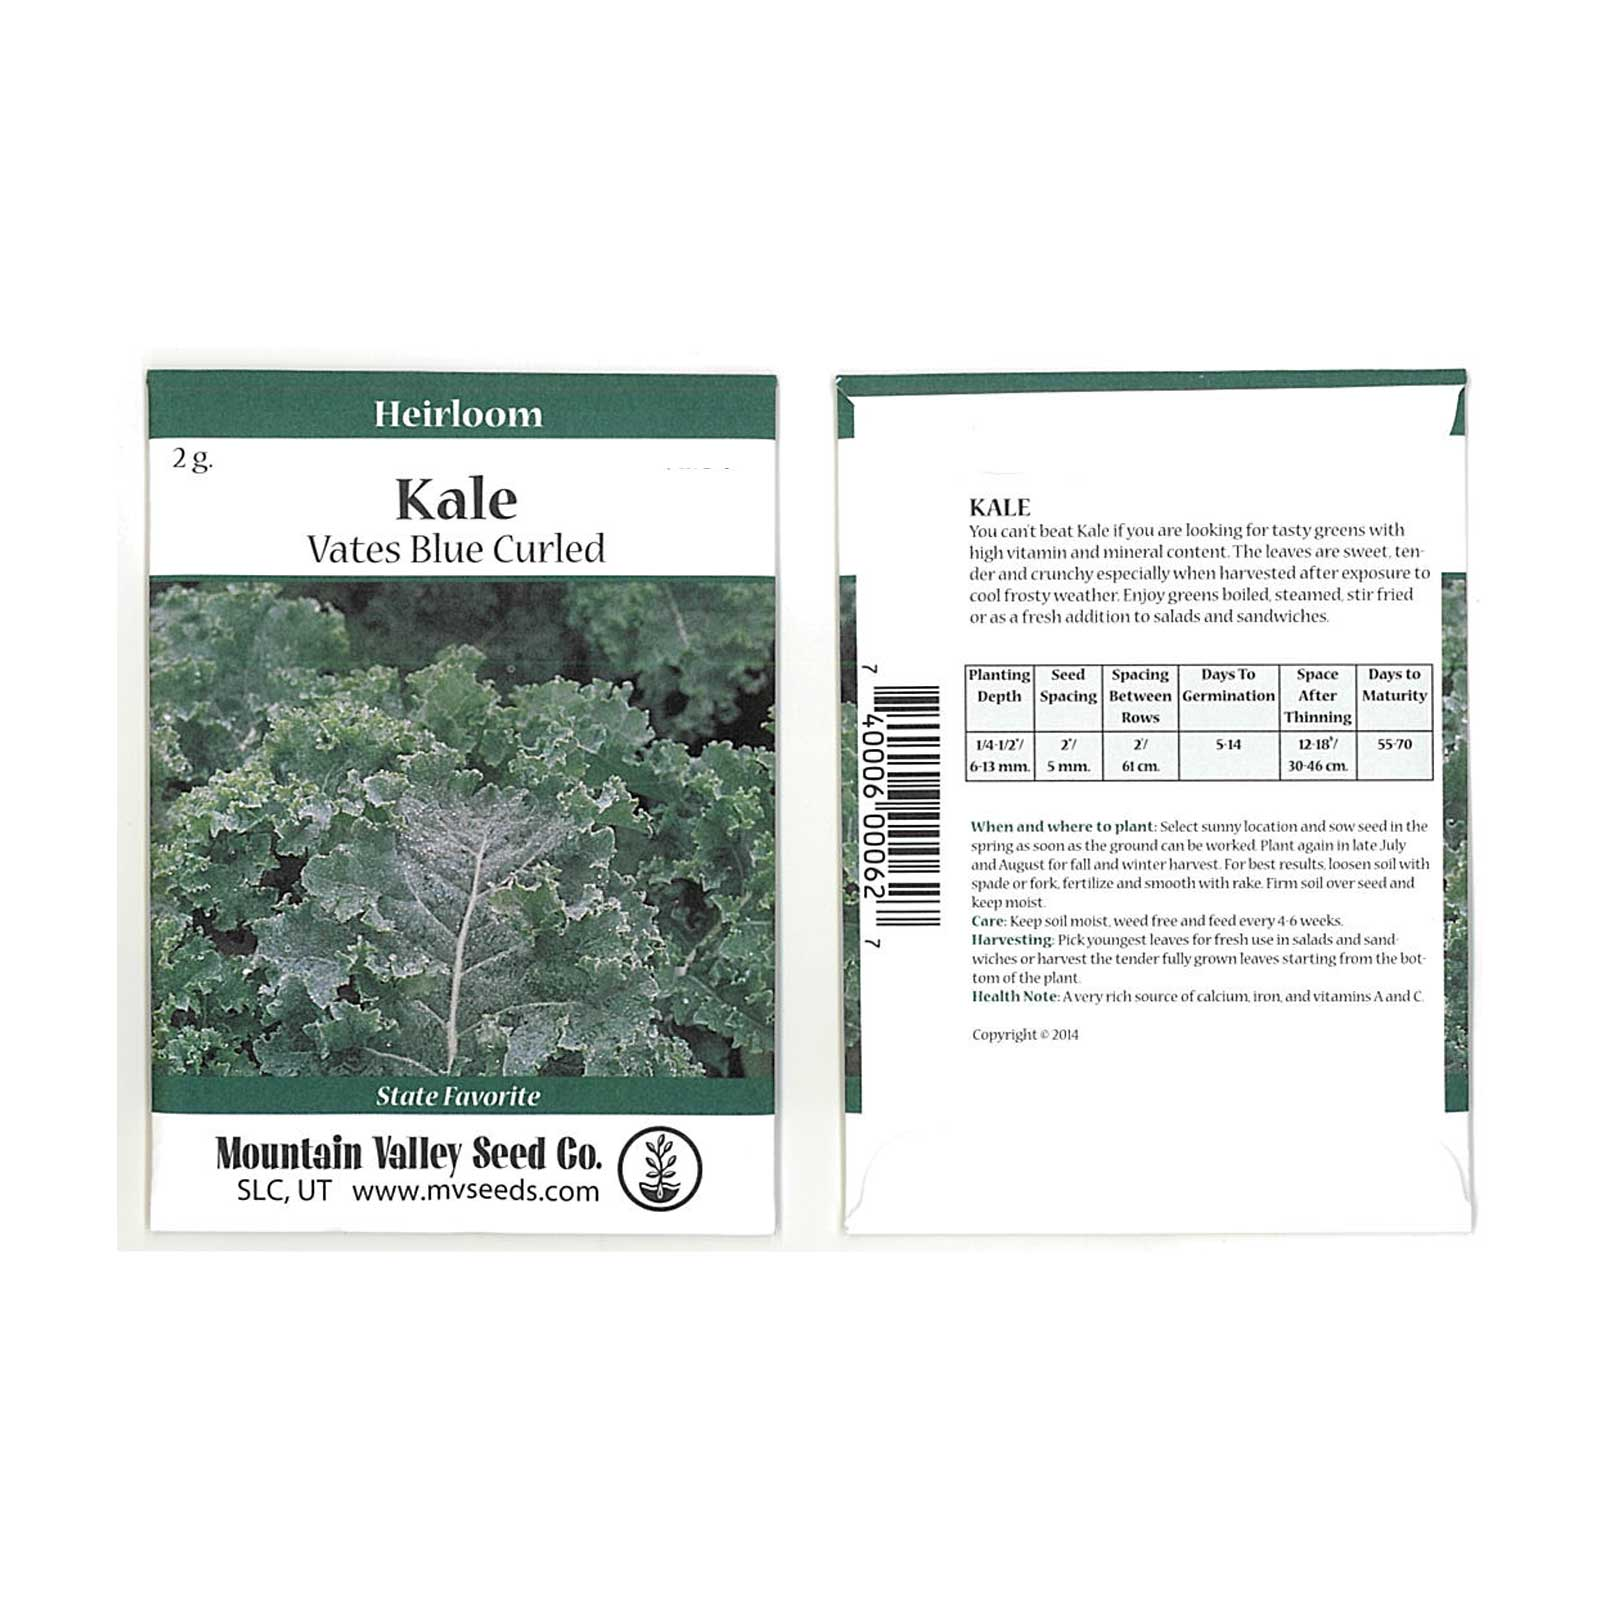 Kale Garden Seeds - Vates Blue Scotch Curled - 2 Gram Packet - Non-GMO, Heirloom- Vegetable Gardening & Microgreens